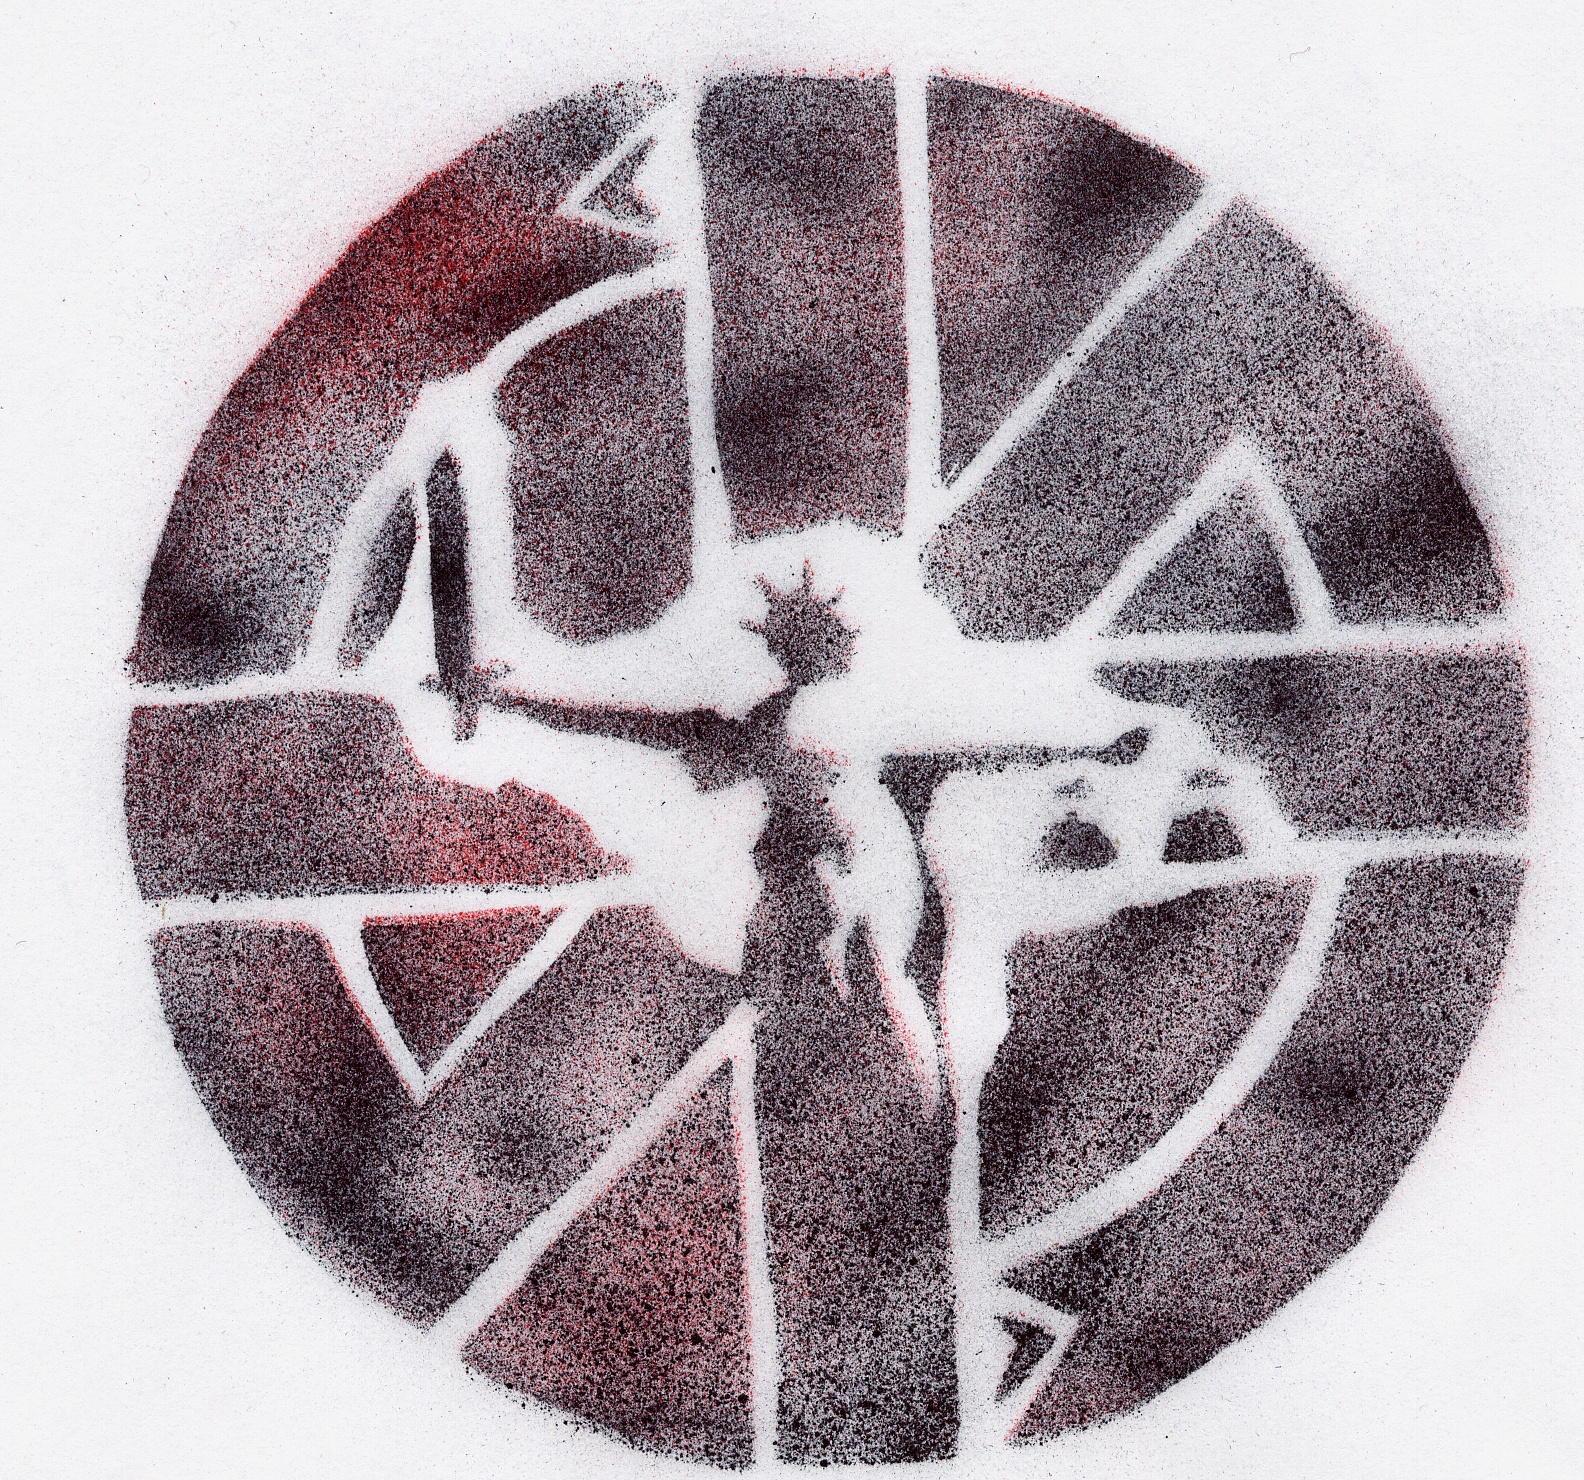 Crass justice logo stencil